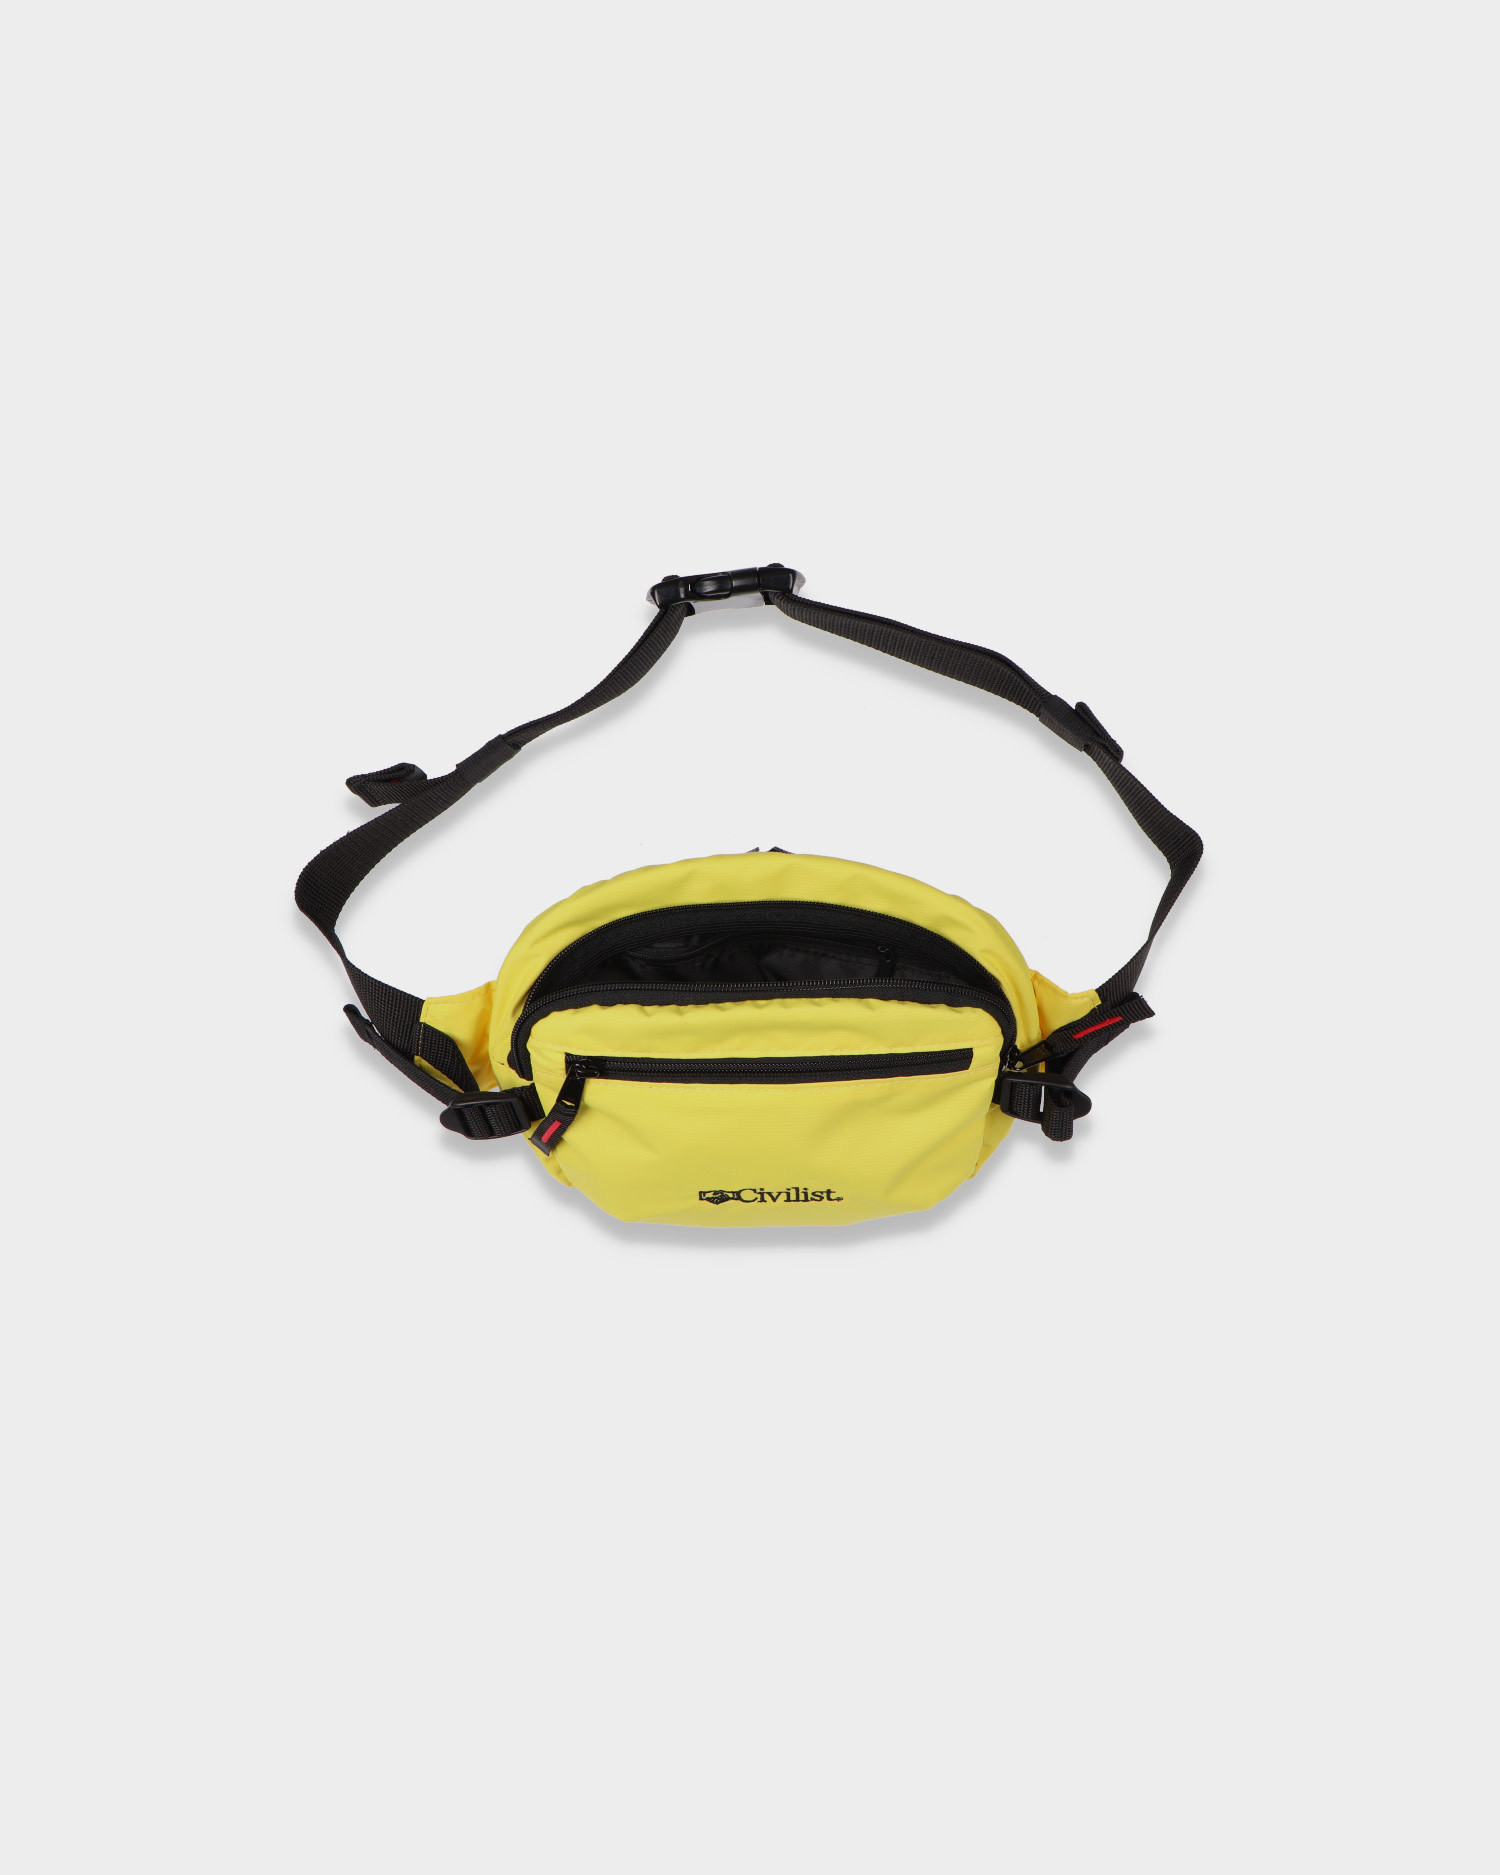 Civilist Hip Bag Yellow